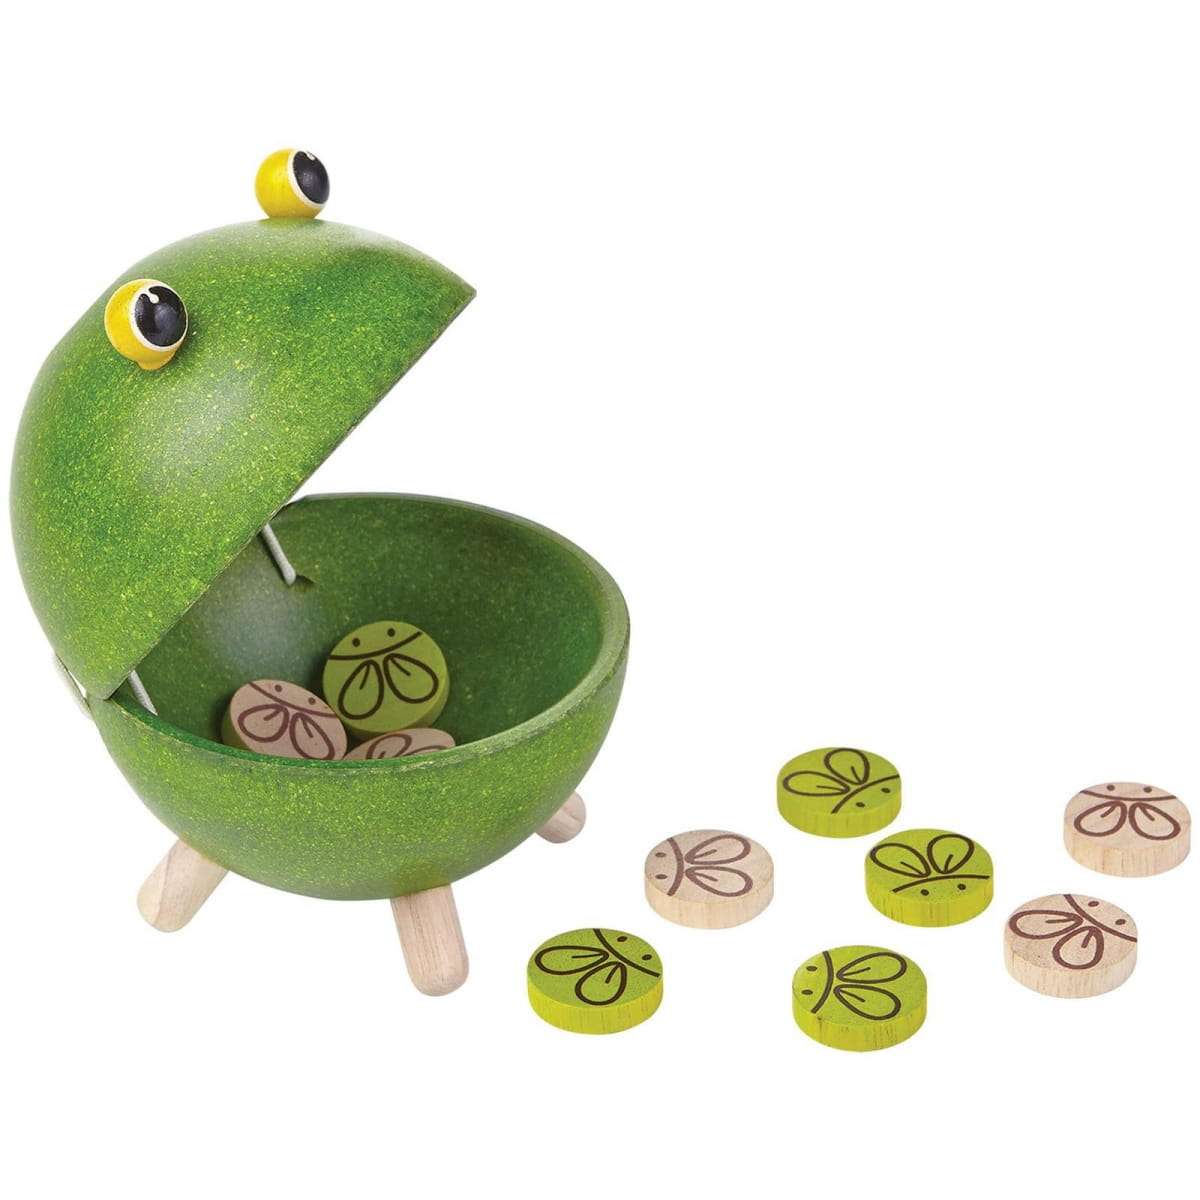 Развивающая игра Plan Toys Лягушка